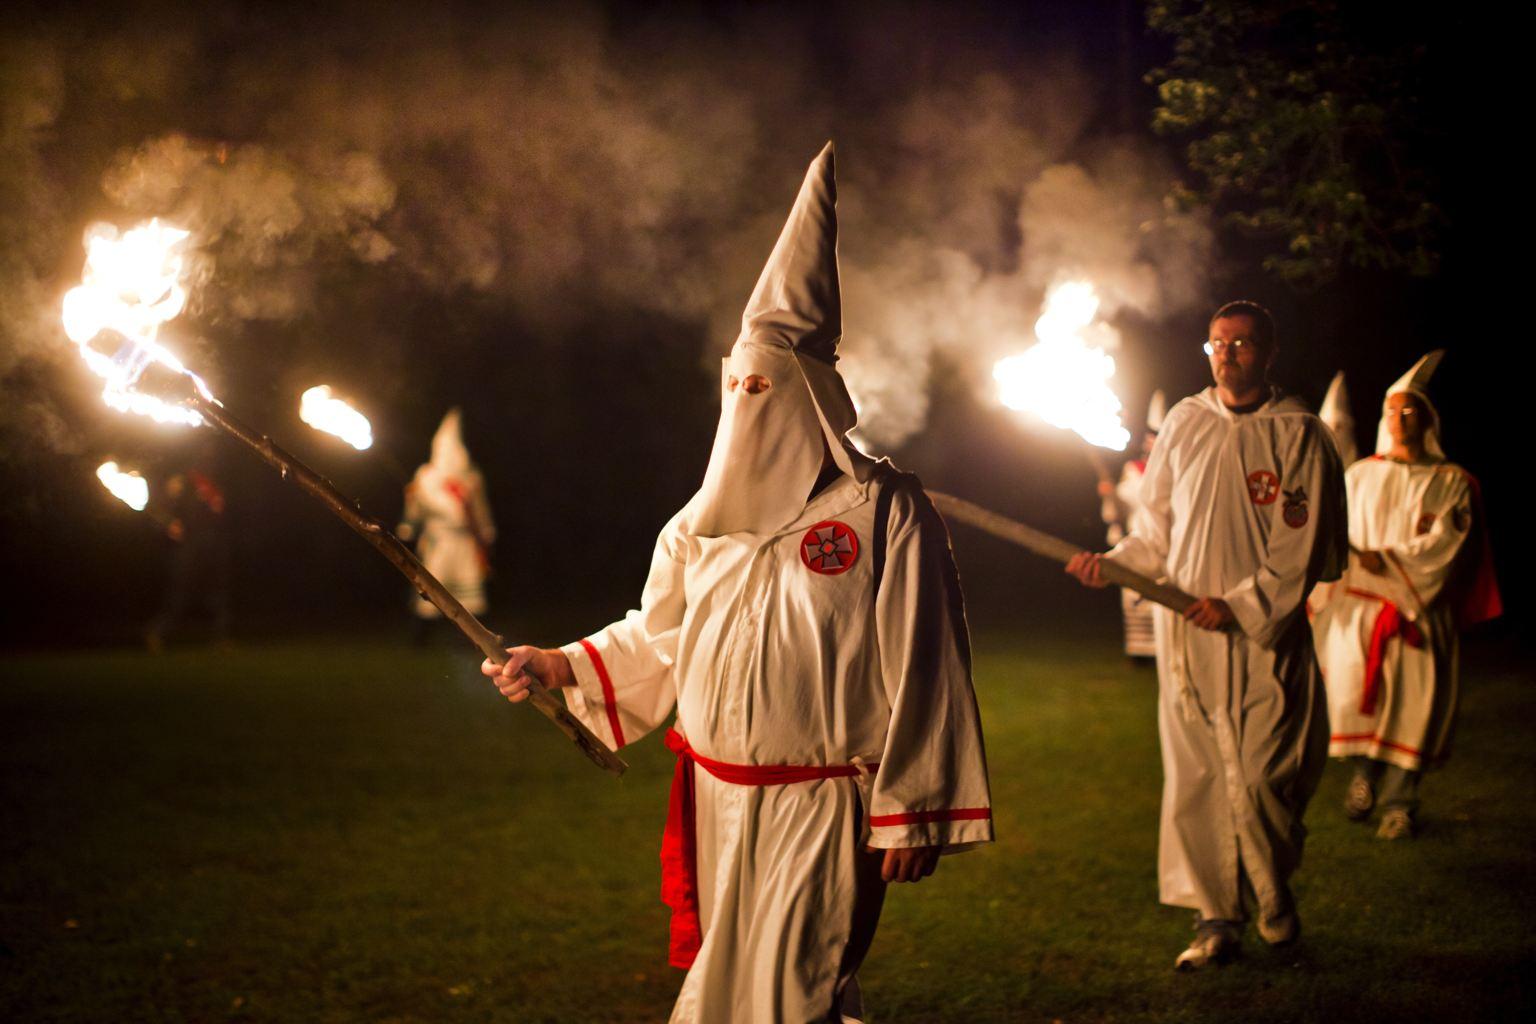 Ku Klux Klan'dan destek: Trump'a oy vermemek ihanettir